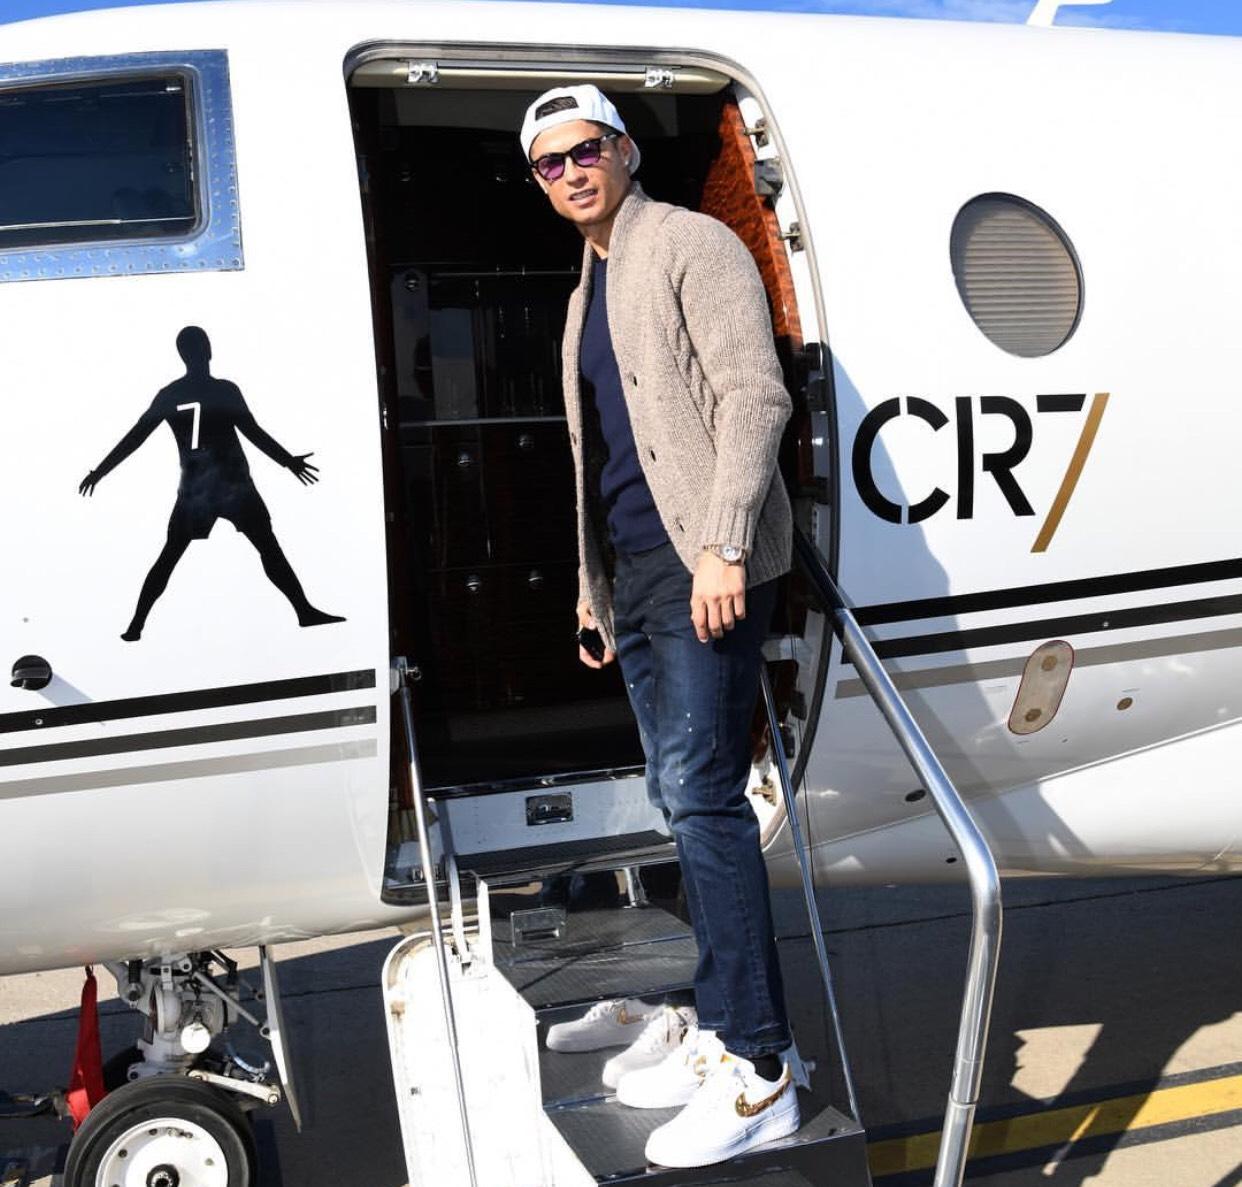 Gaya modis Cristiano Ronaldo. Foto: IG @cristiano